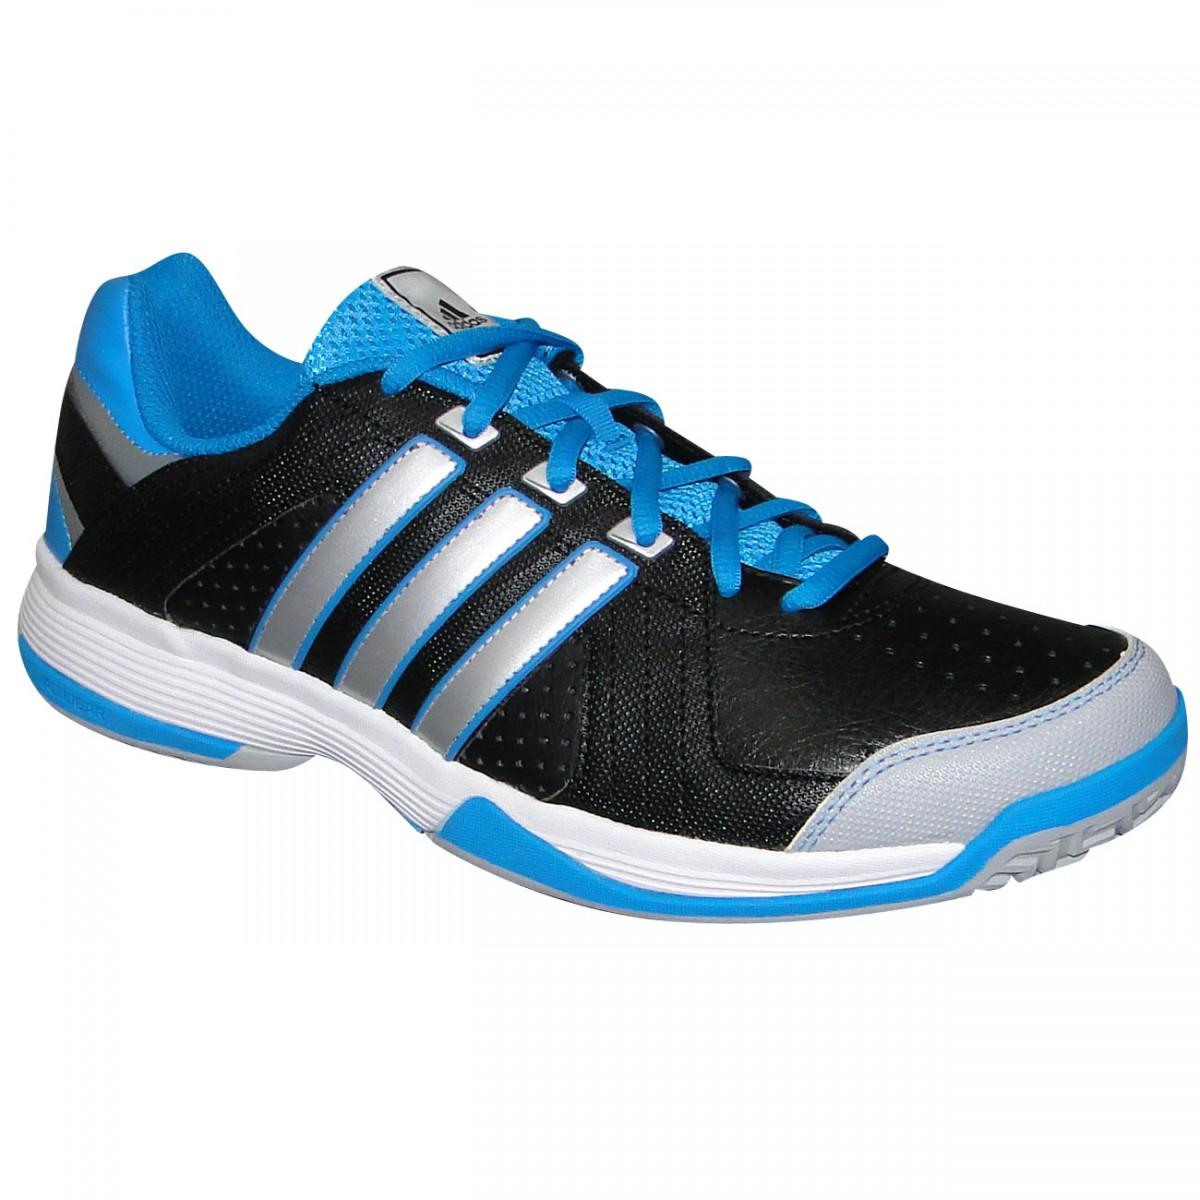 91744295562 Tenis Adidas Response Approach M19792 - Preto Azul - Chuteira Nike ...